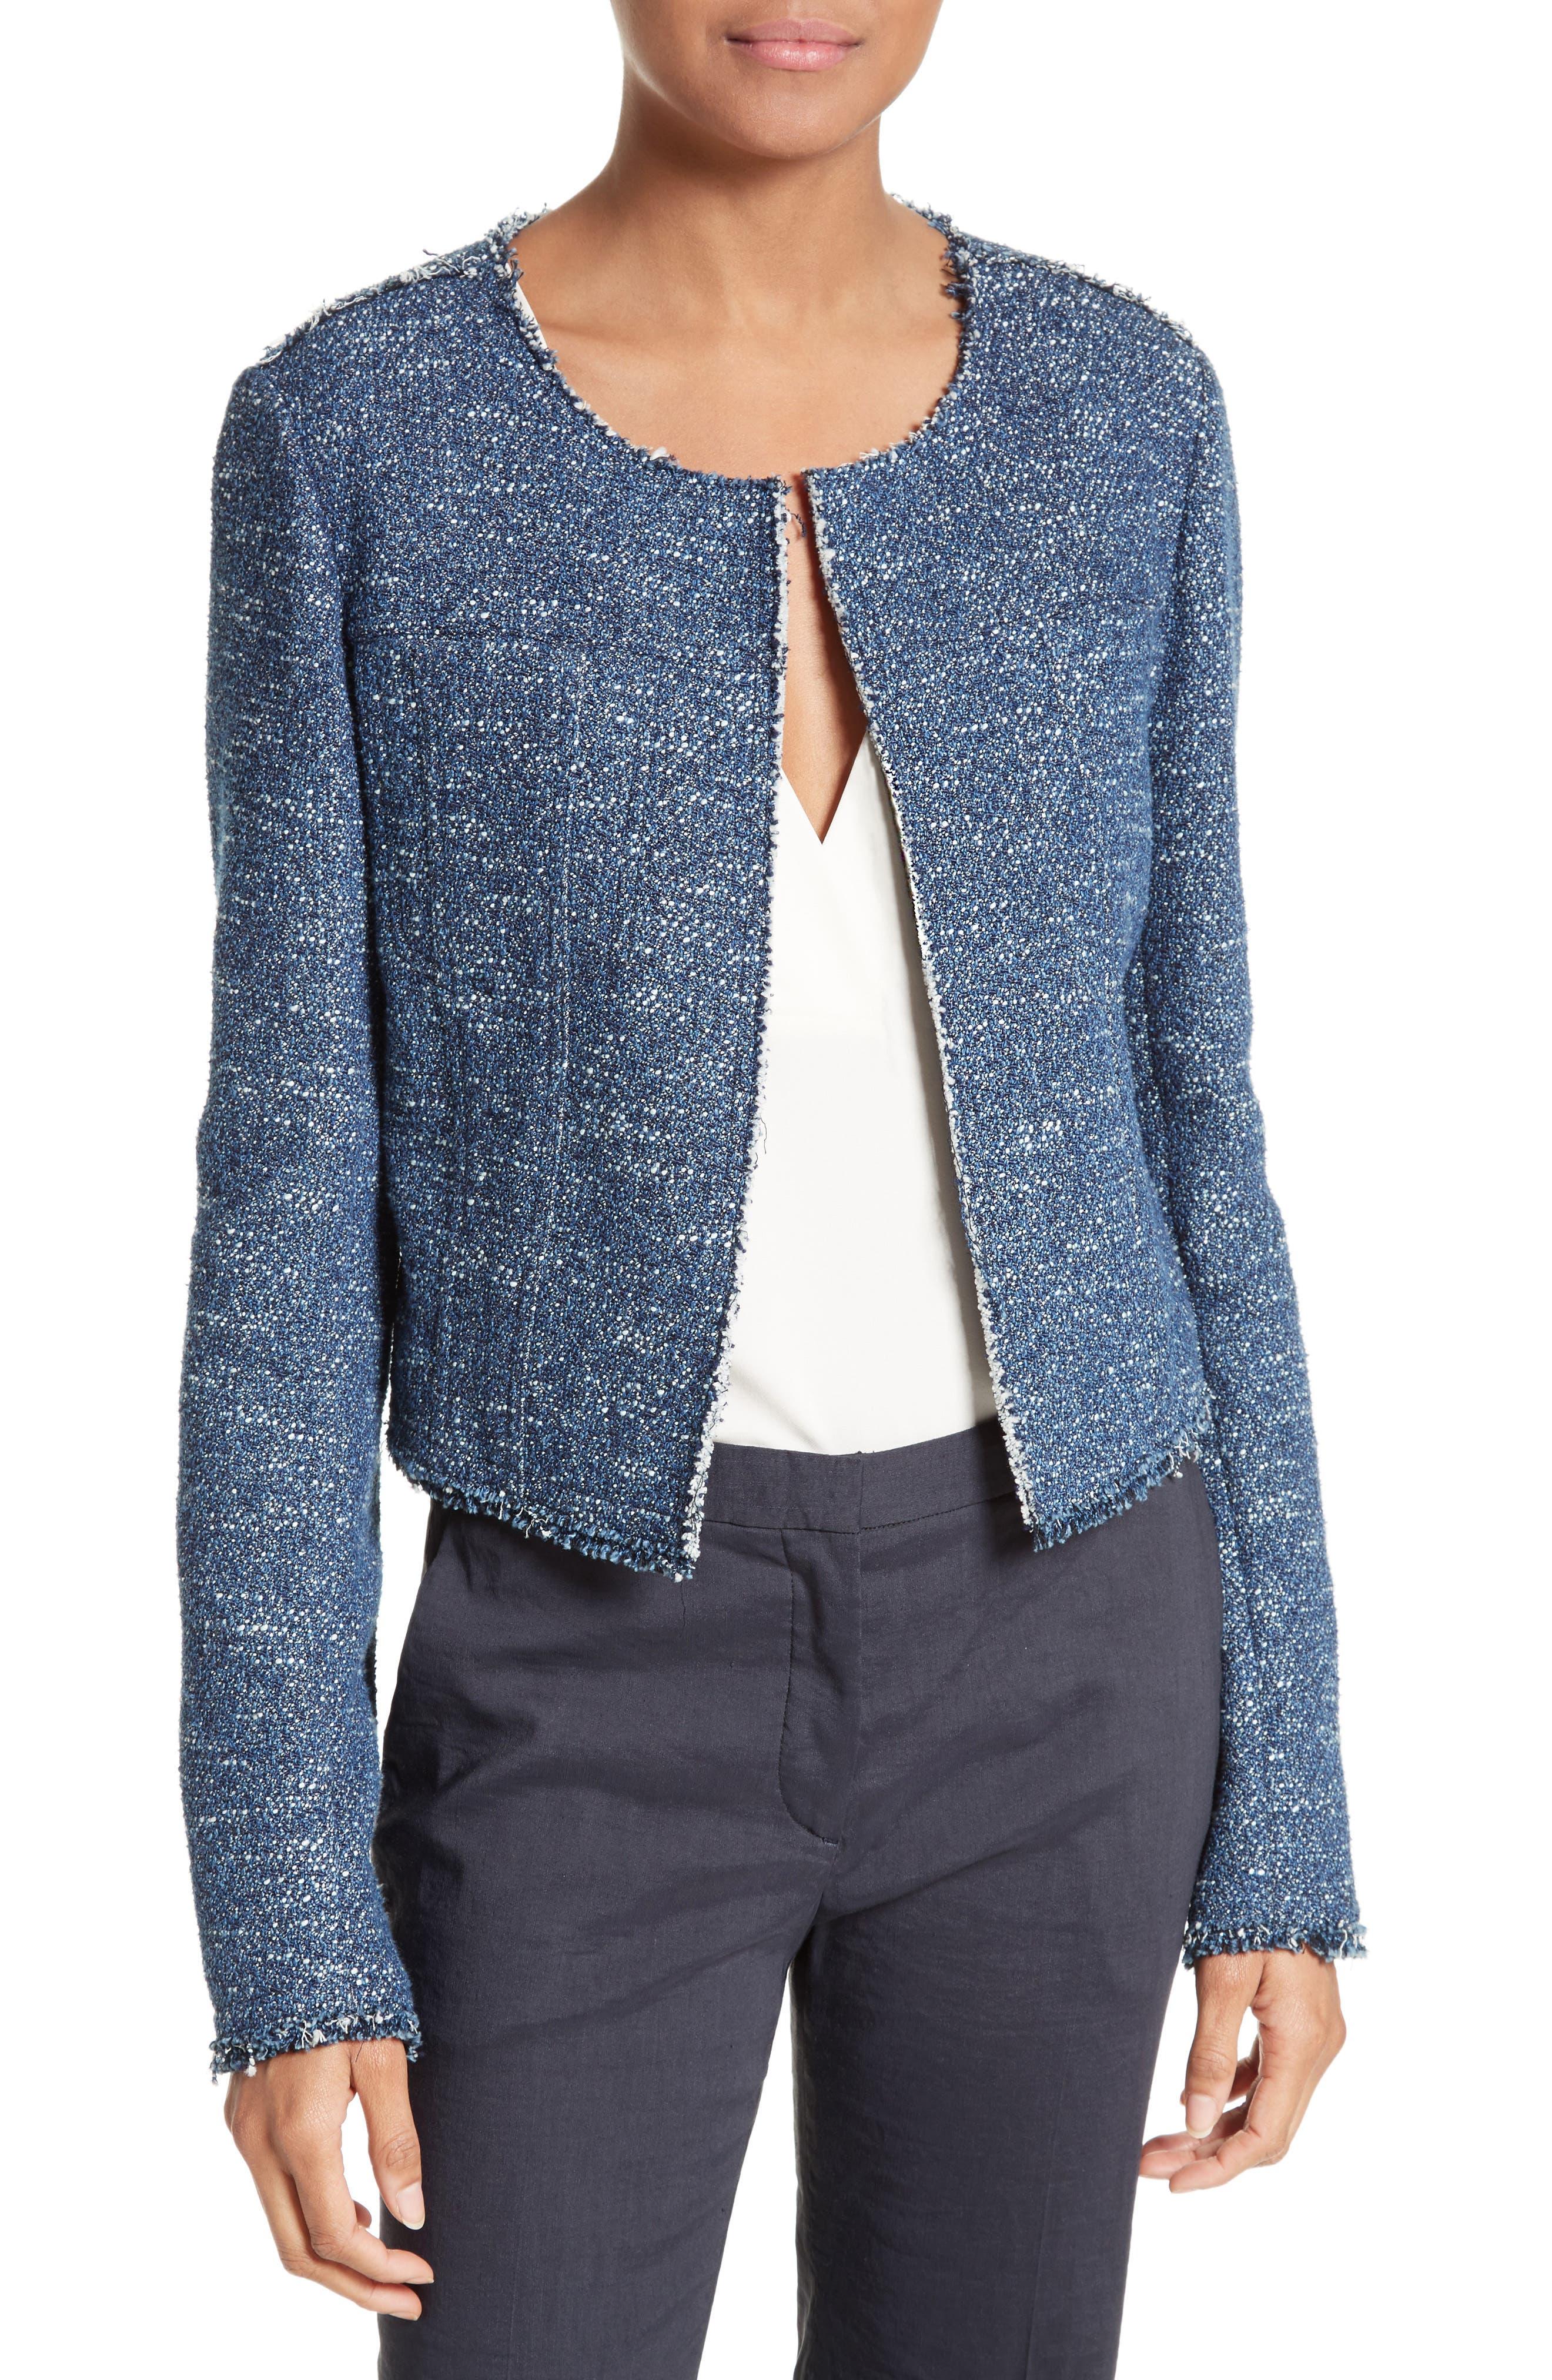 Ualana Indigo Tweed Jacket,                             Main thumbnail 1, color,                             498